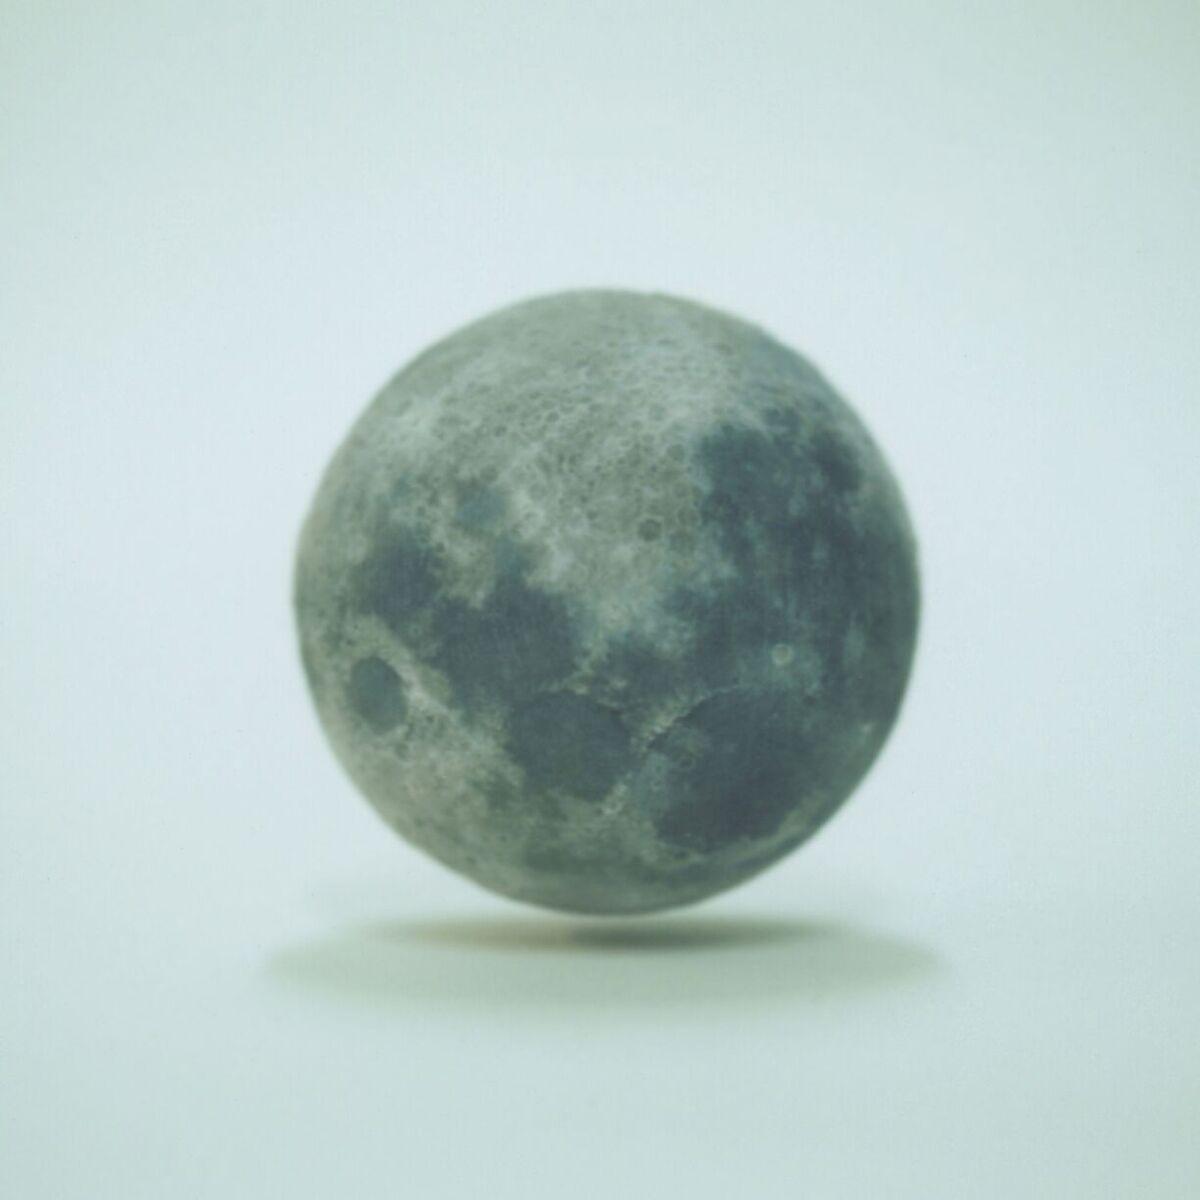 Moon | Polaroid-600SE | Fujifilm FP-100C | Luke Harby